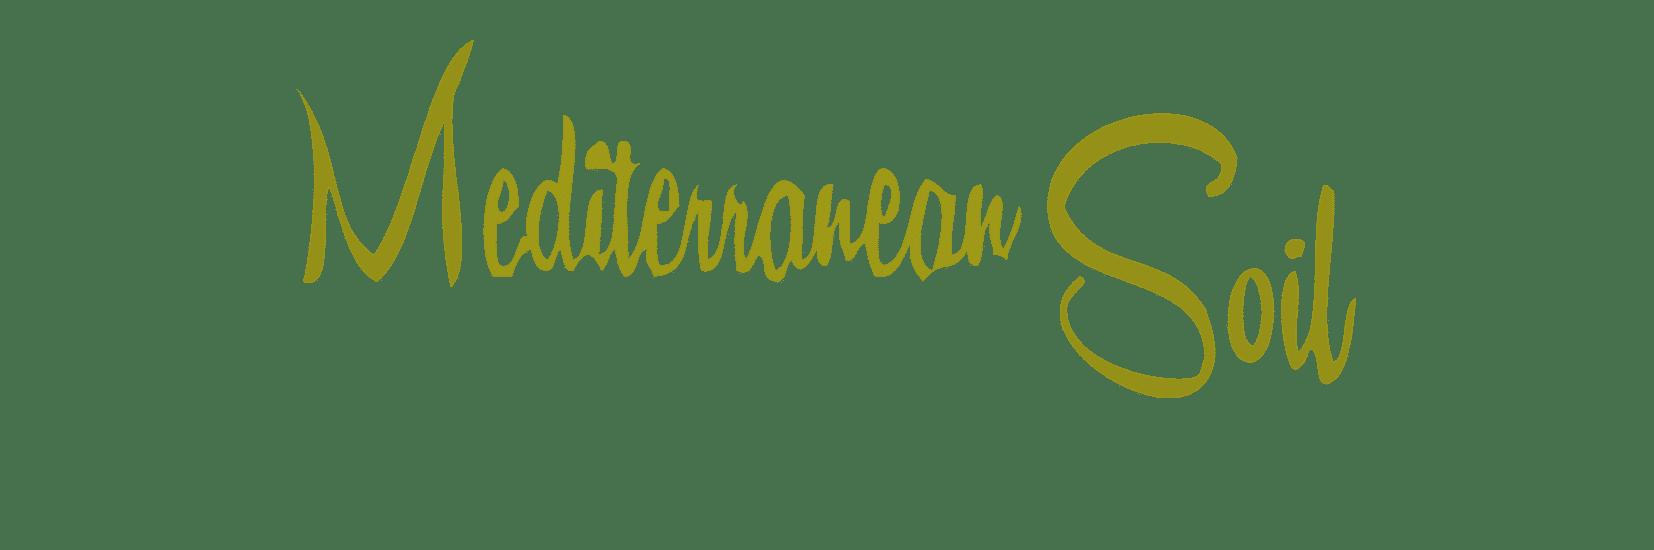 Mediterranean Soil Logo